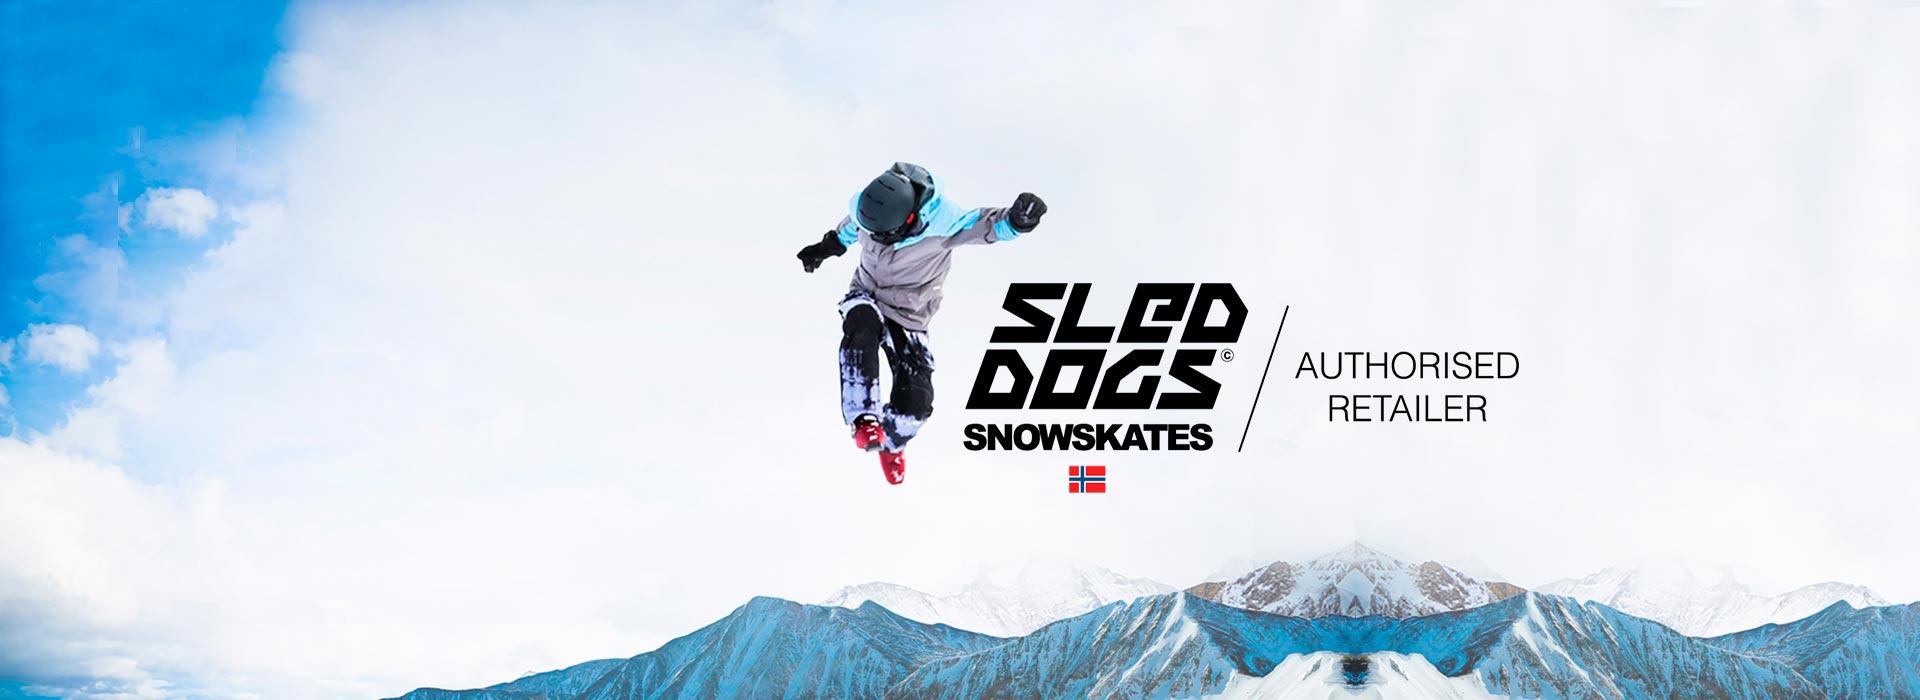 Sled Dogs Snowskates